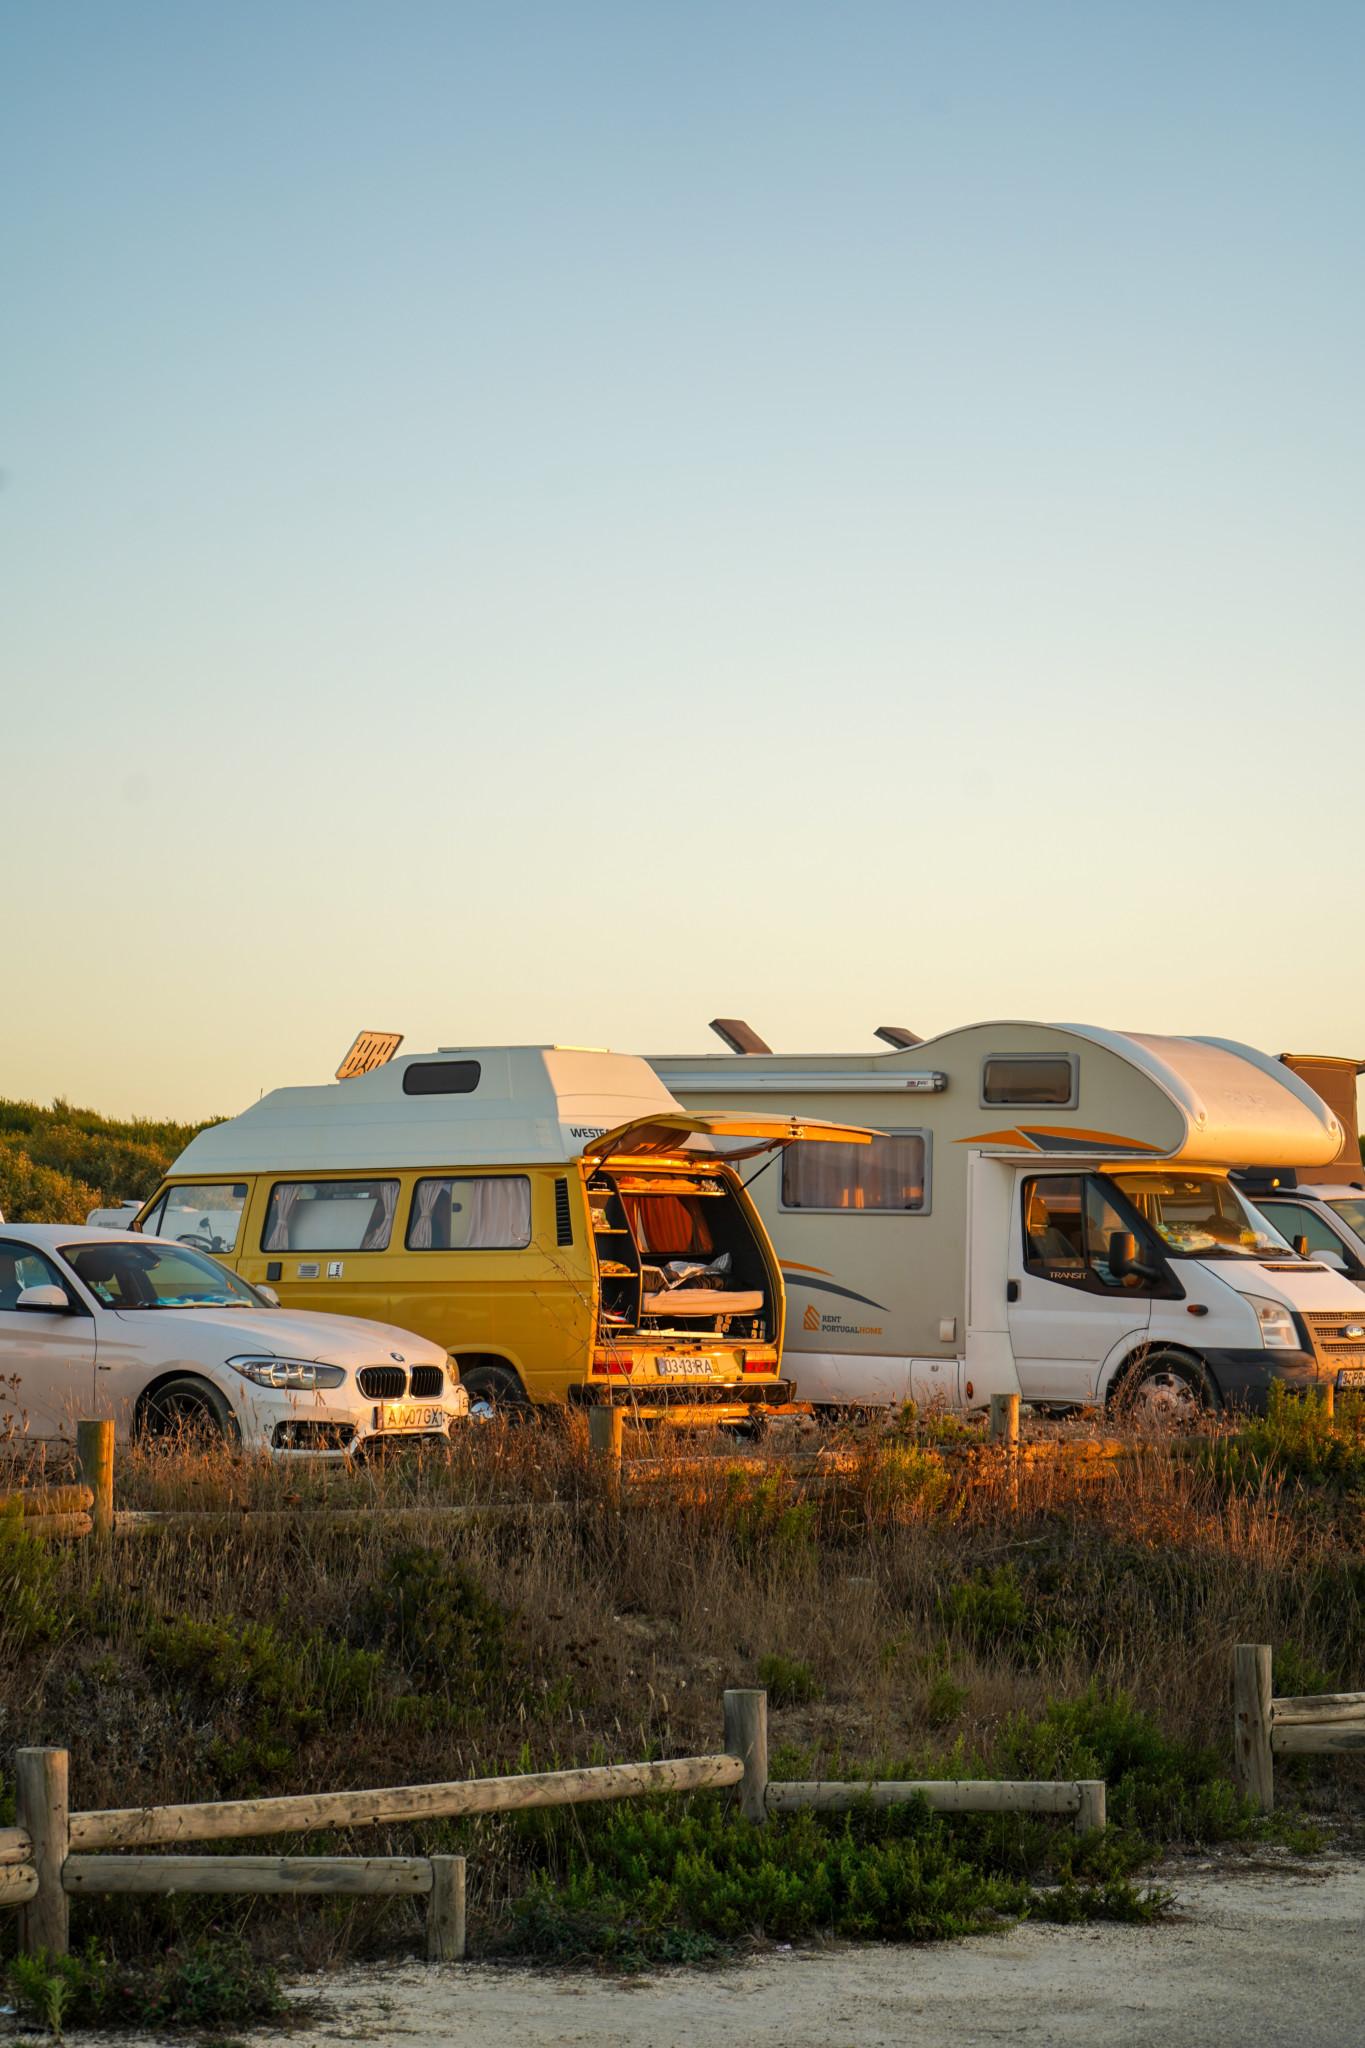 Camping in Odeceixe